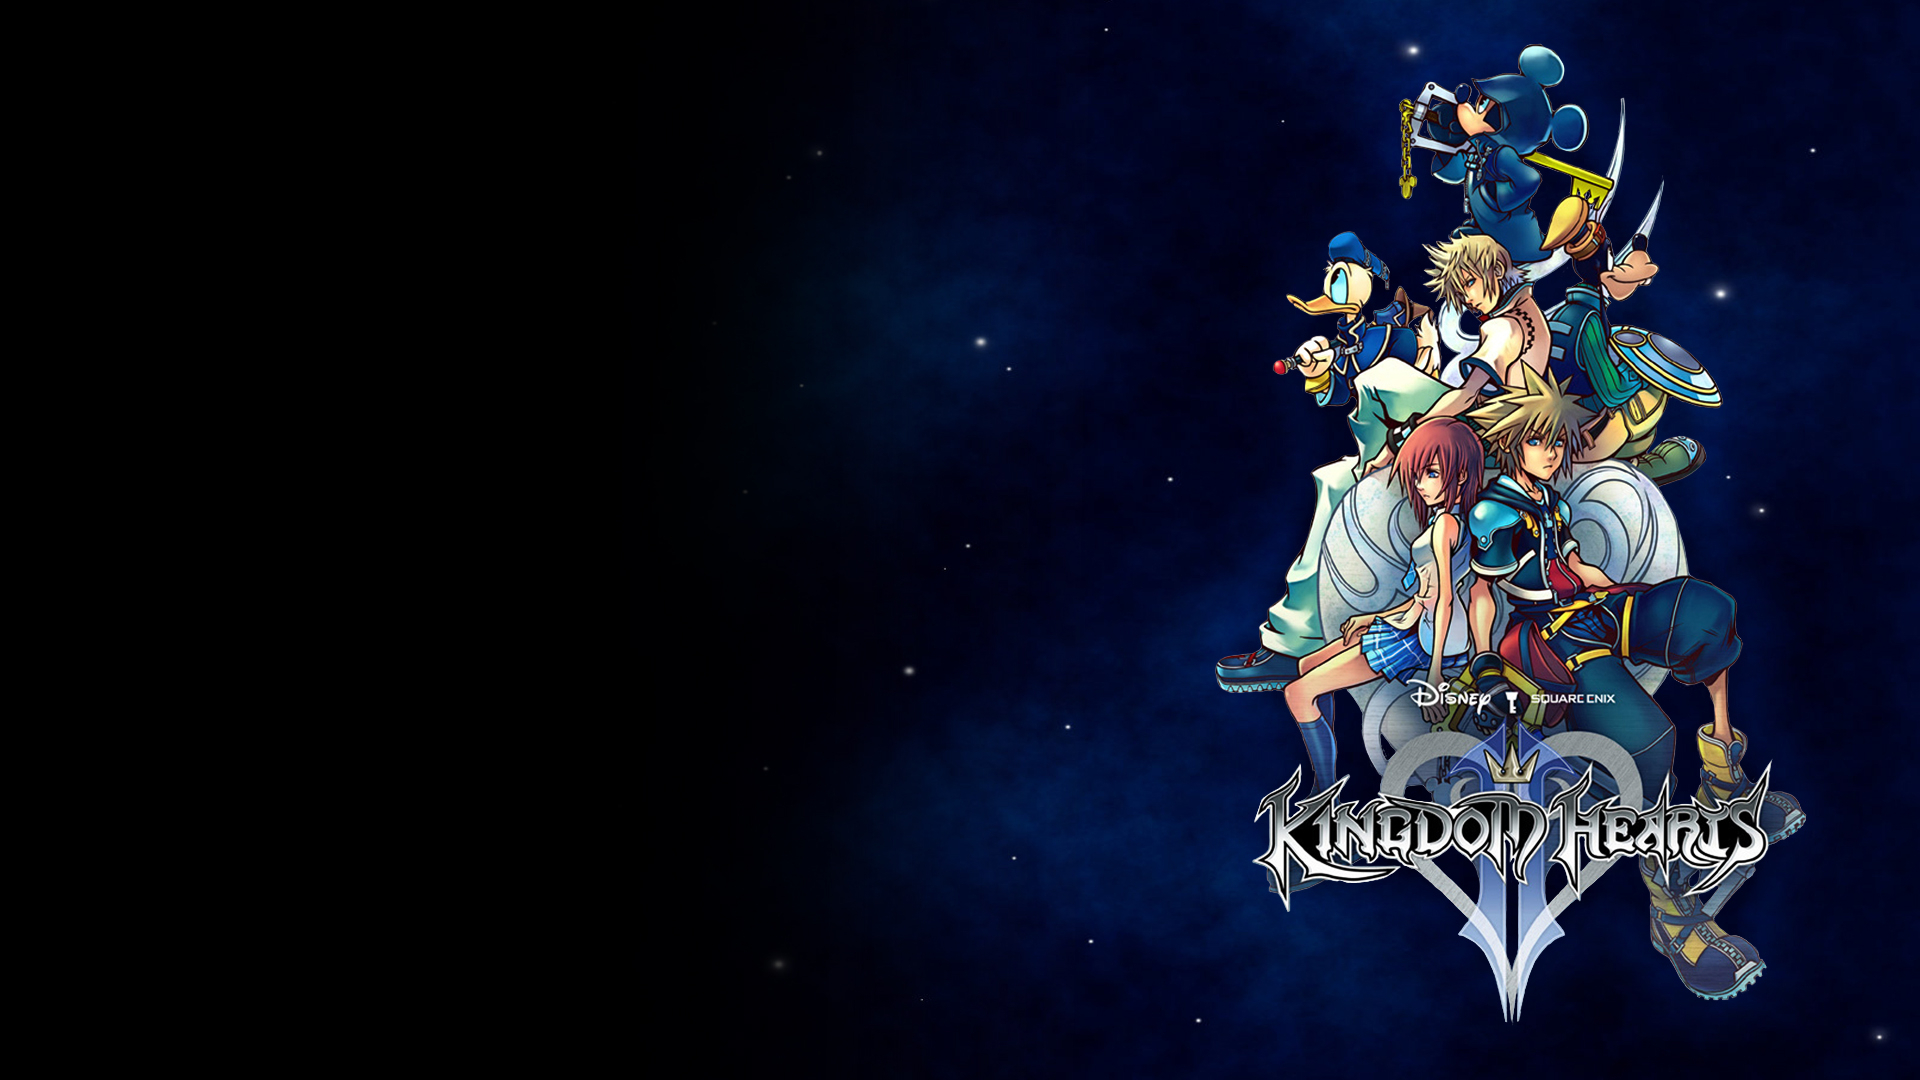 kingdom hearts ii wallpaper hd wallpaper | background image